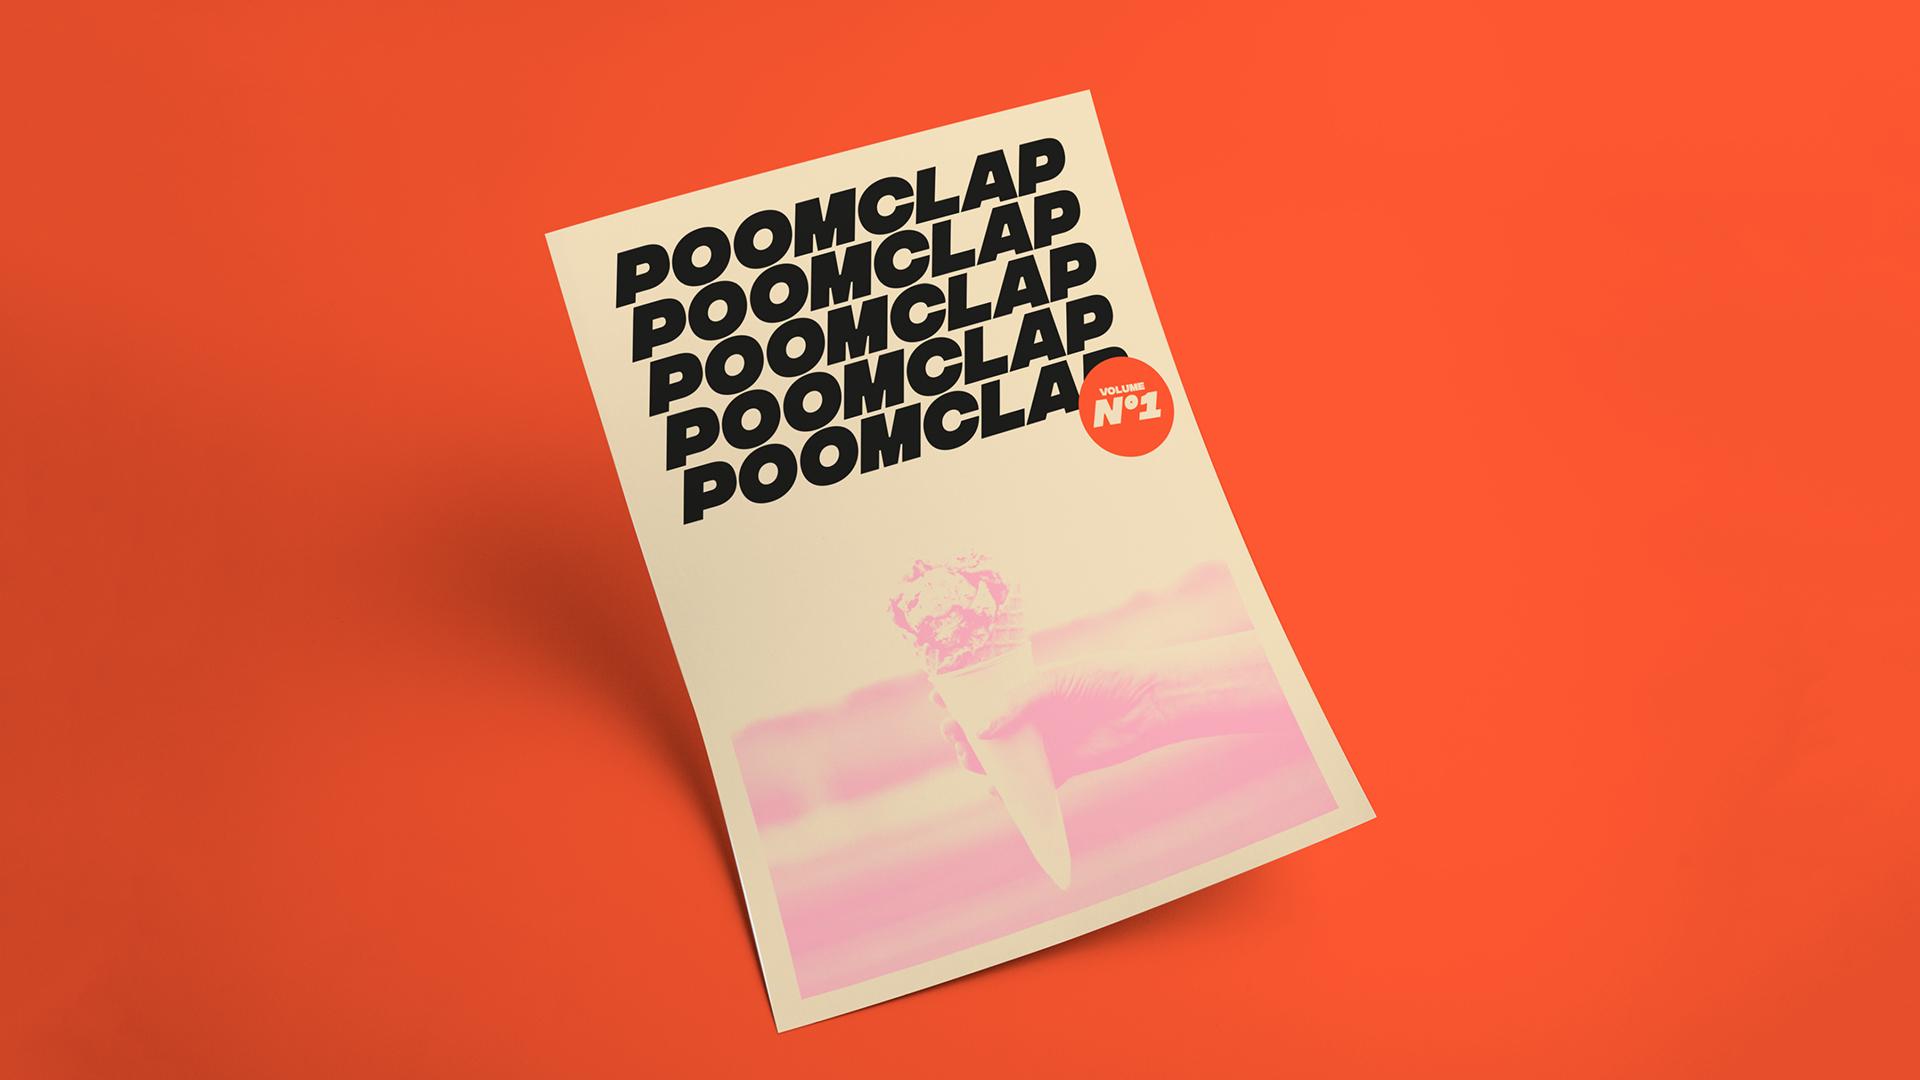 InspoFinds-POOMCLAP-01.jpg